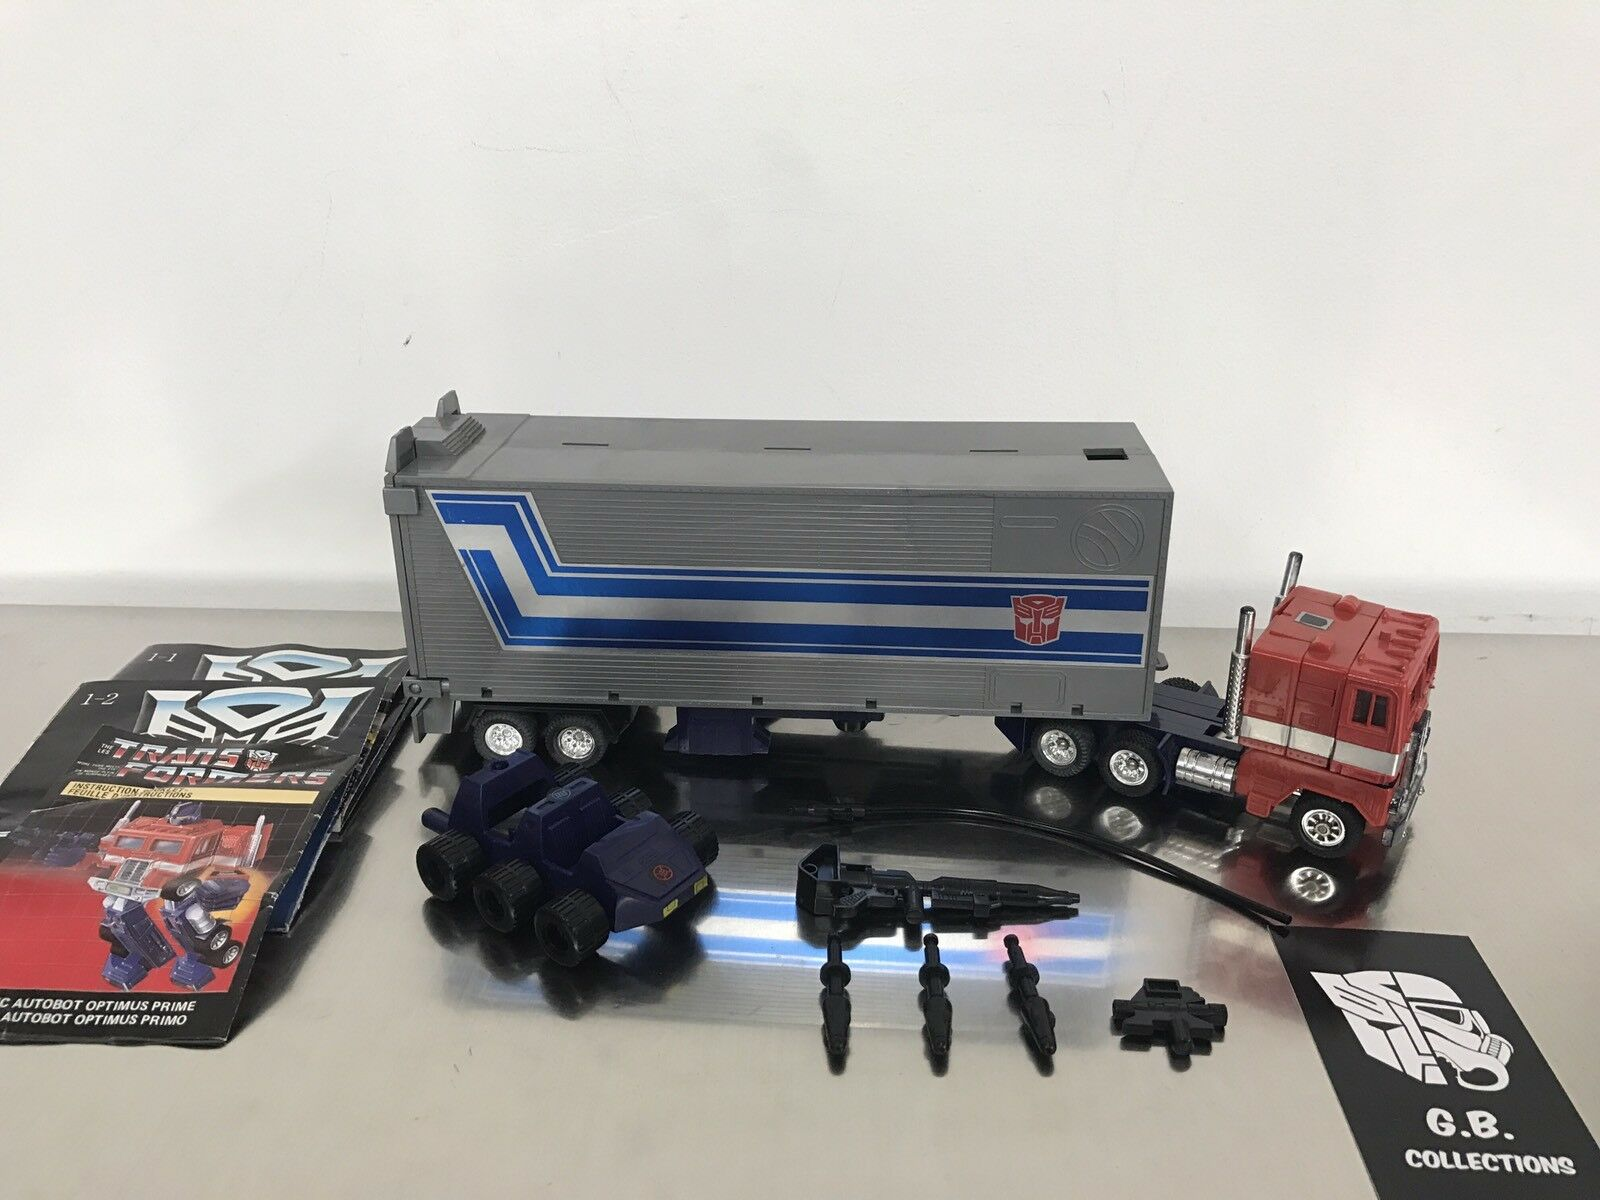 G1 transformers optimus prime 98% komplett - autobot - leader -